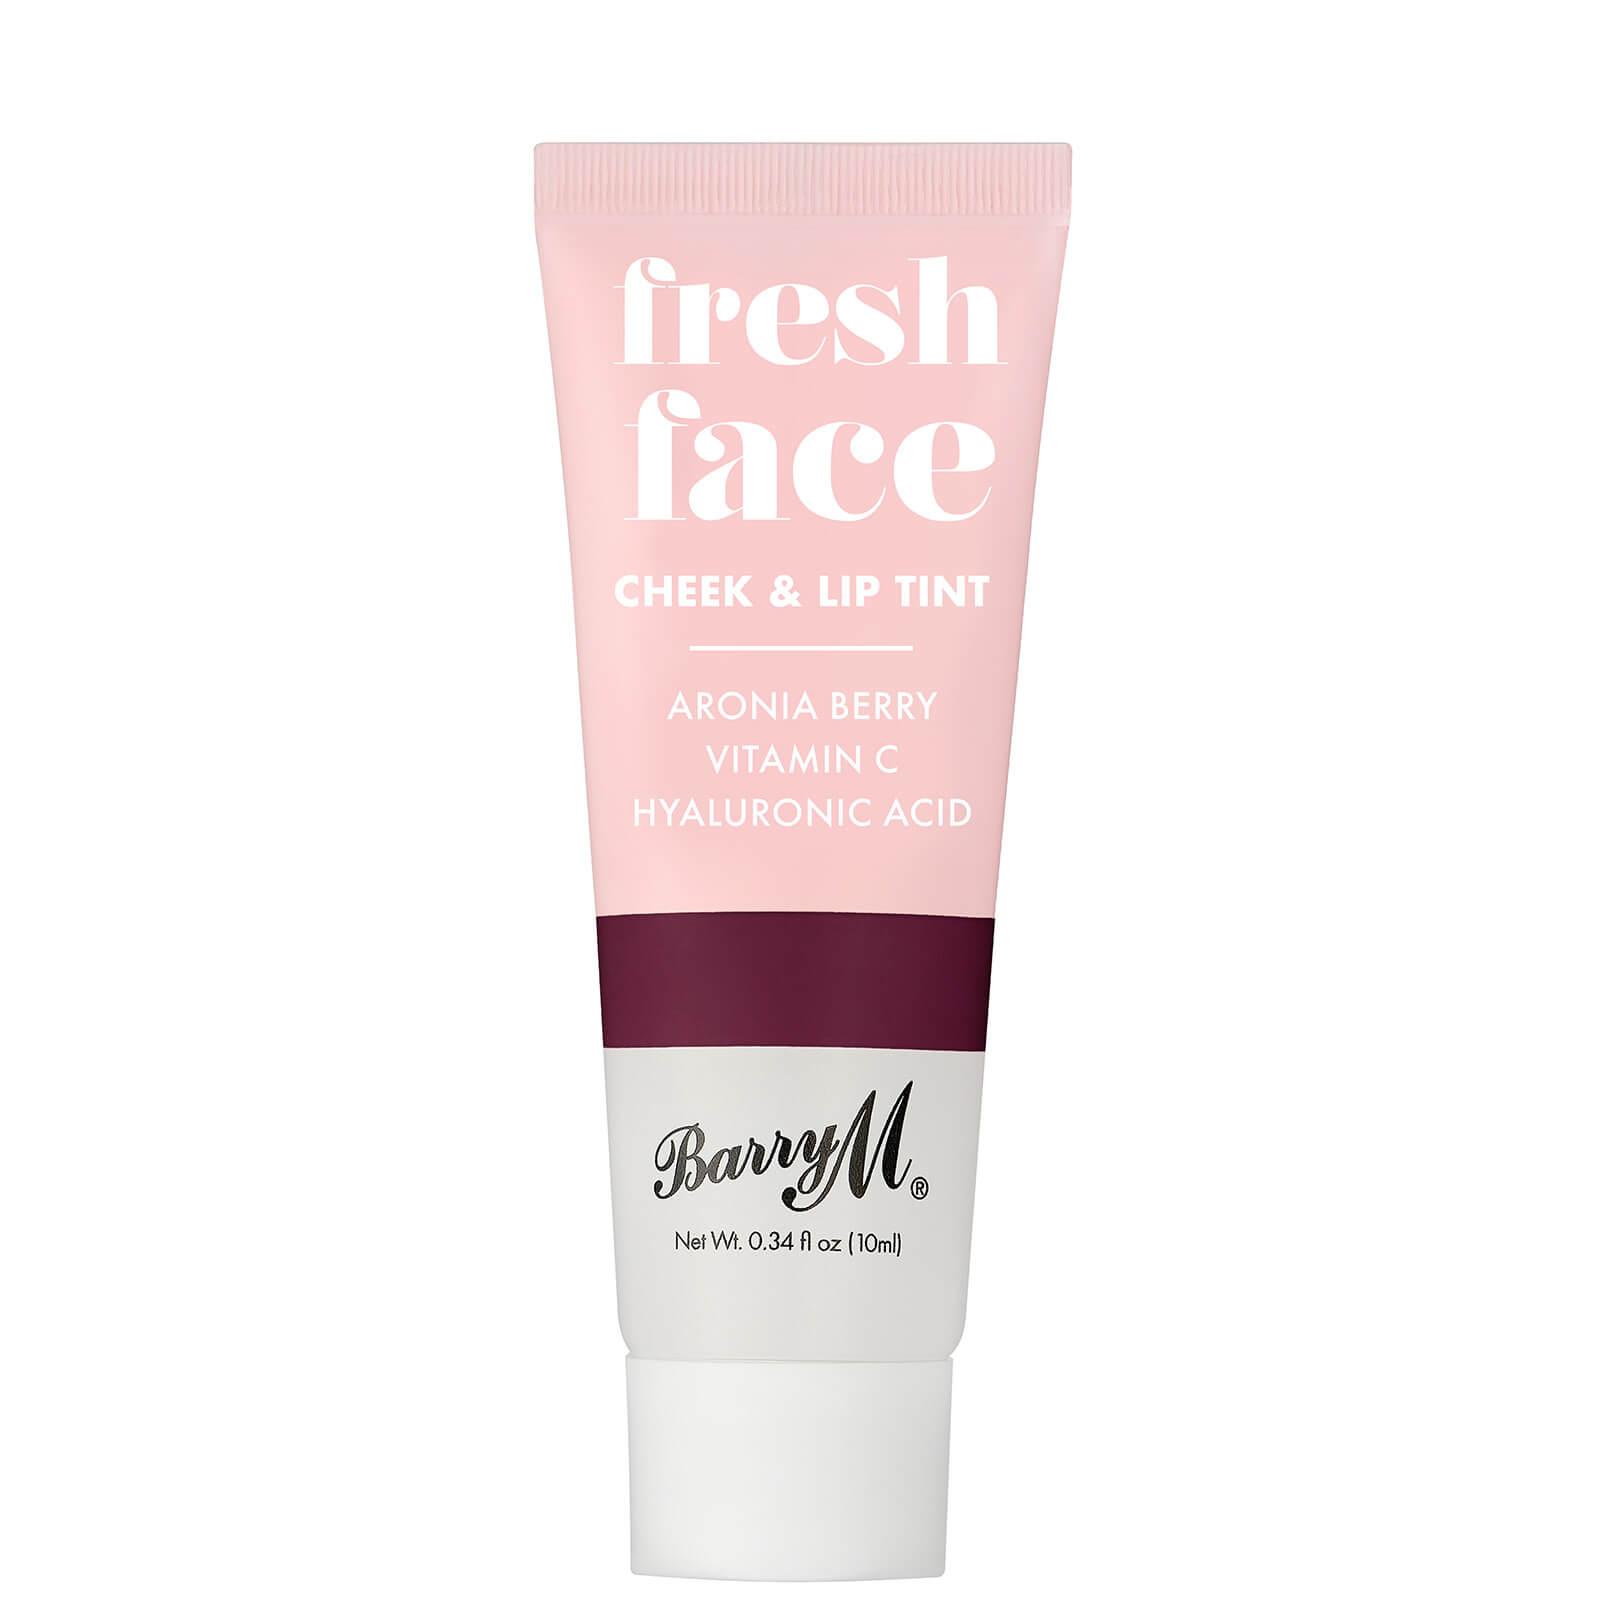 Купить Barry M Cosmetics Fresh Face Cheek and Lip Tint 10ml (Various Shades) - Orchid Crush